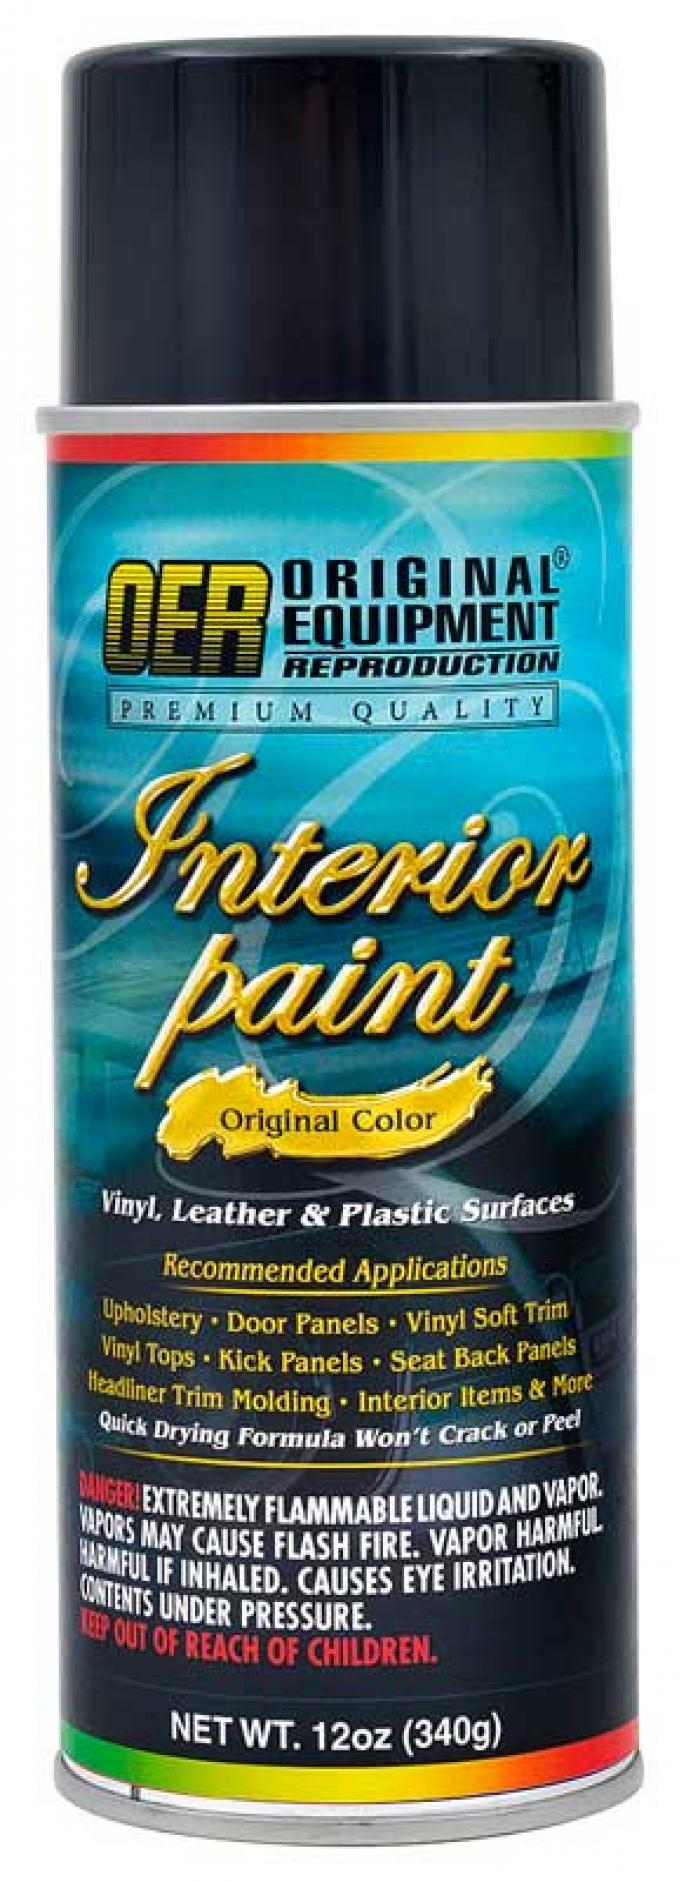 OER 1967 Mustang Dark Gold Metallic Color Coat Spray 12 Oz. Aerosol Can PP915